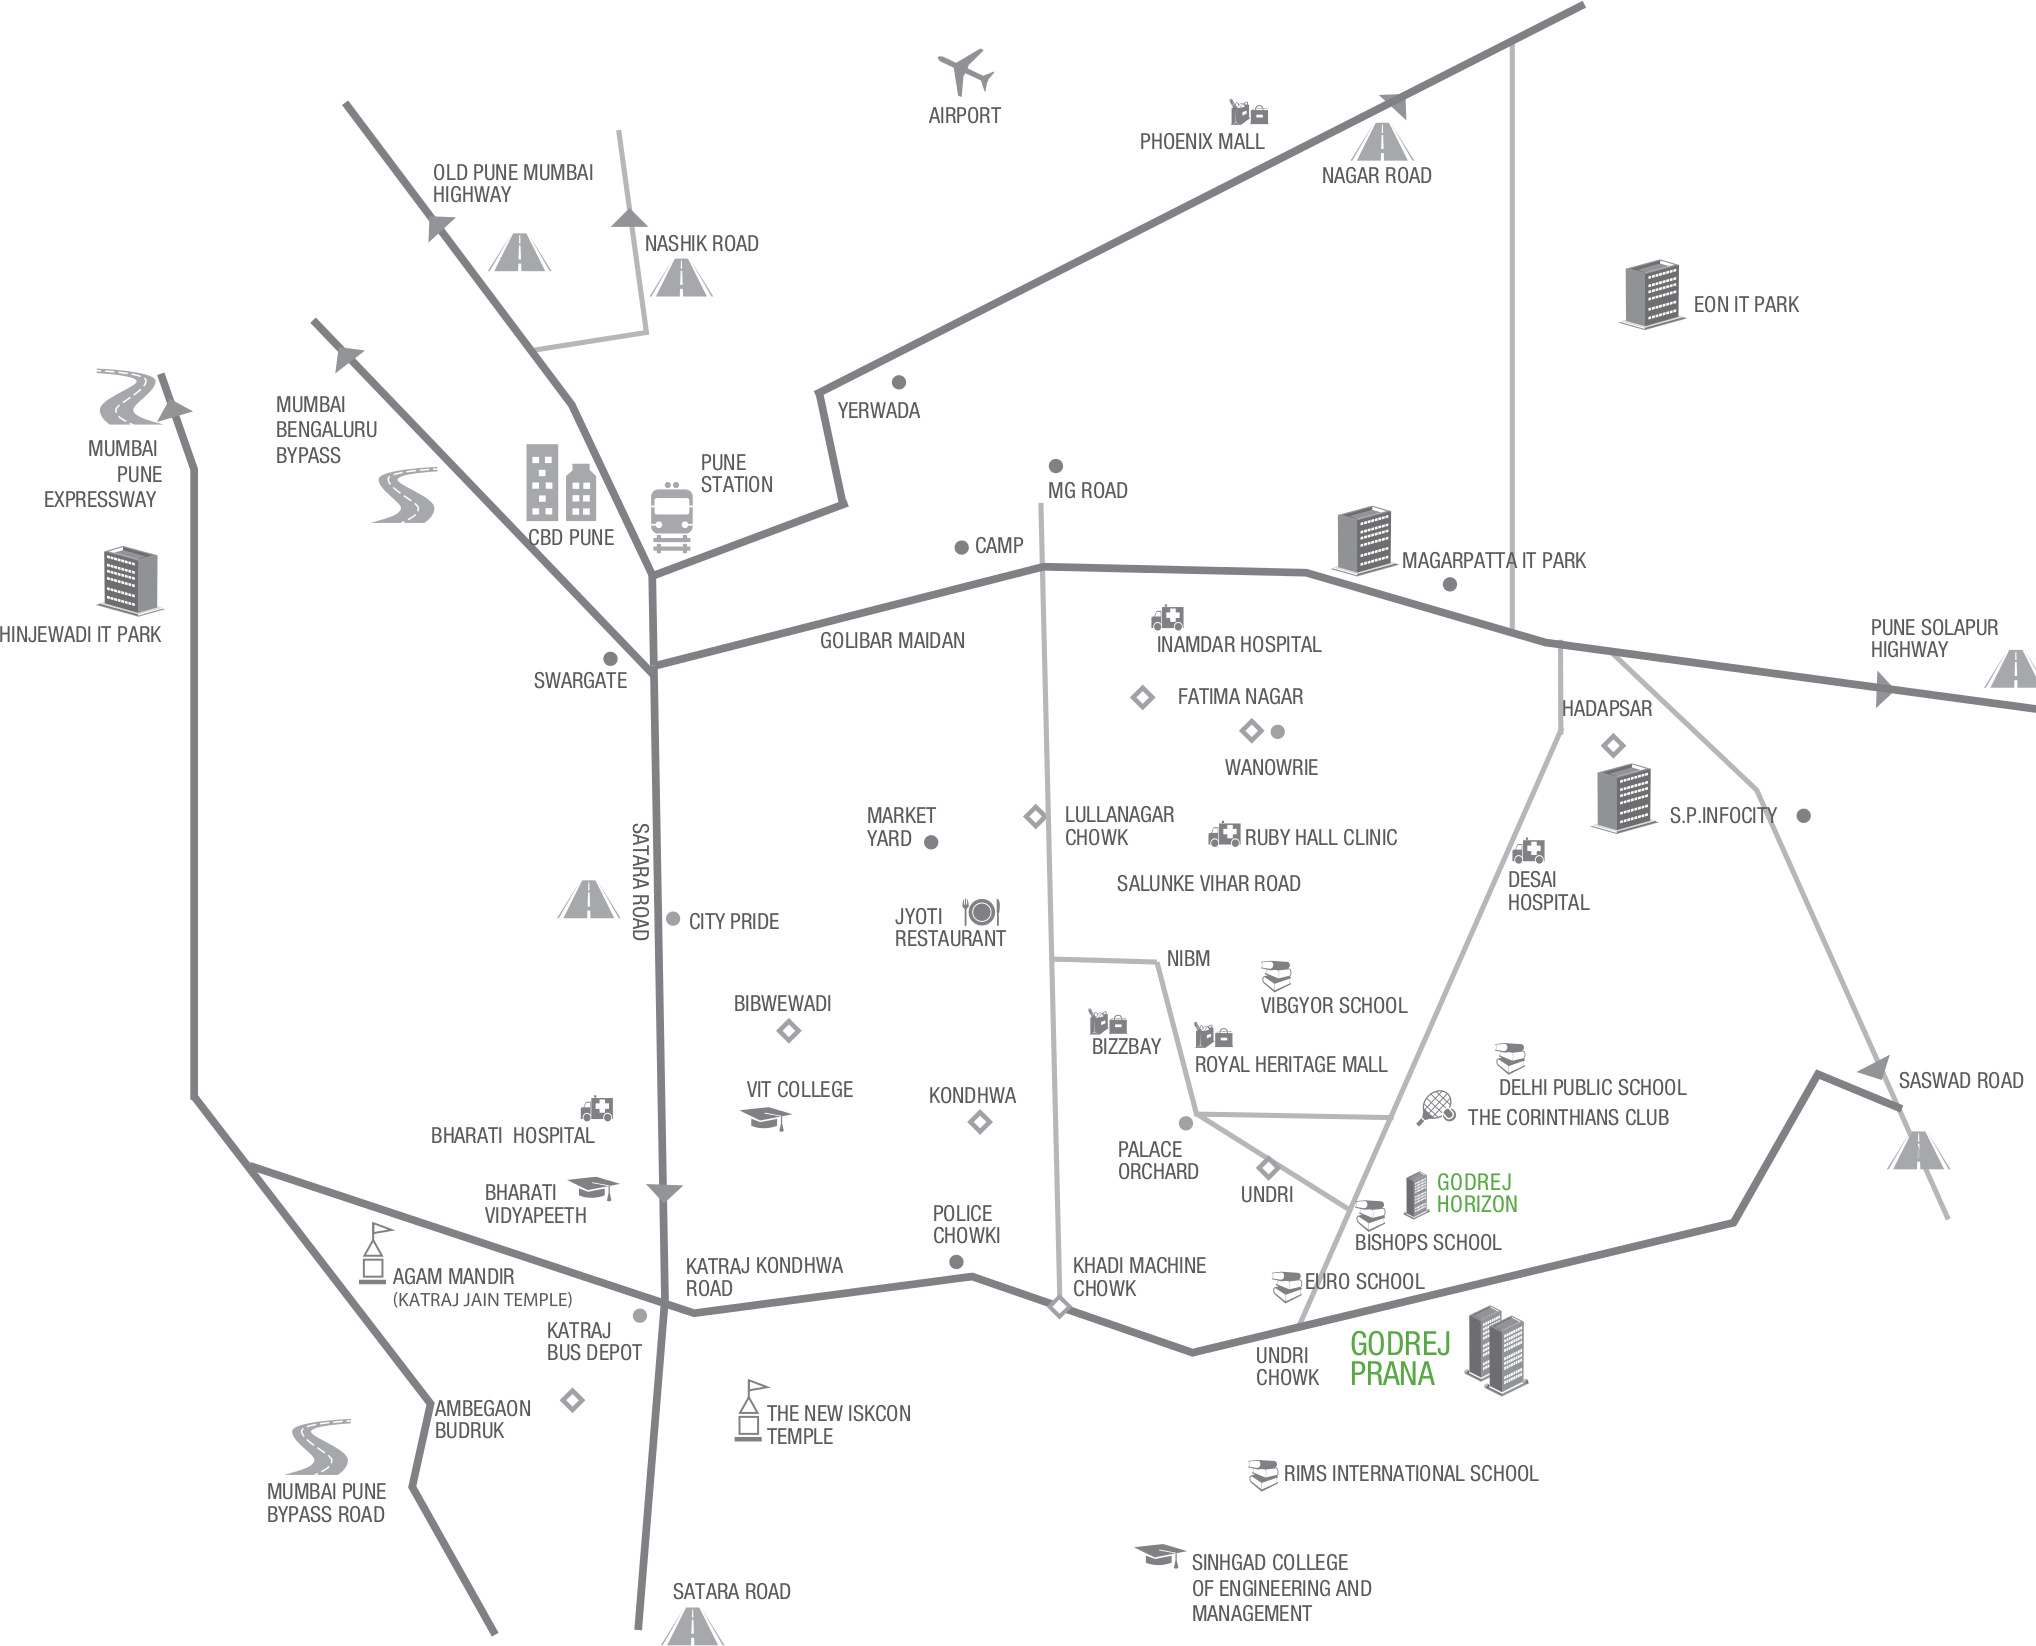 Godrej Prana In Undri Pune Price Location Map Floor Plan Shutters Home Depot Free Download Wiring Diagram Schematic Reviews